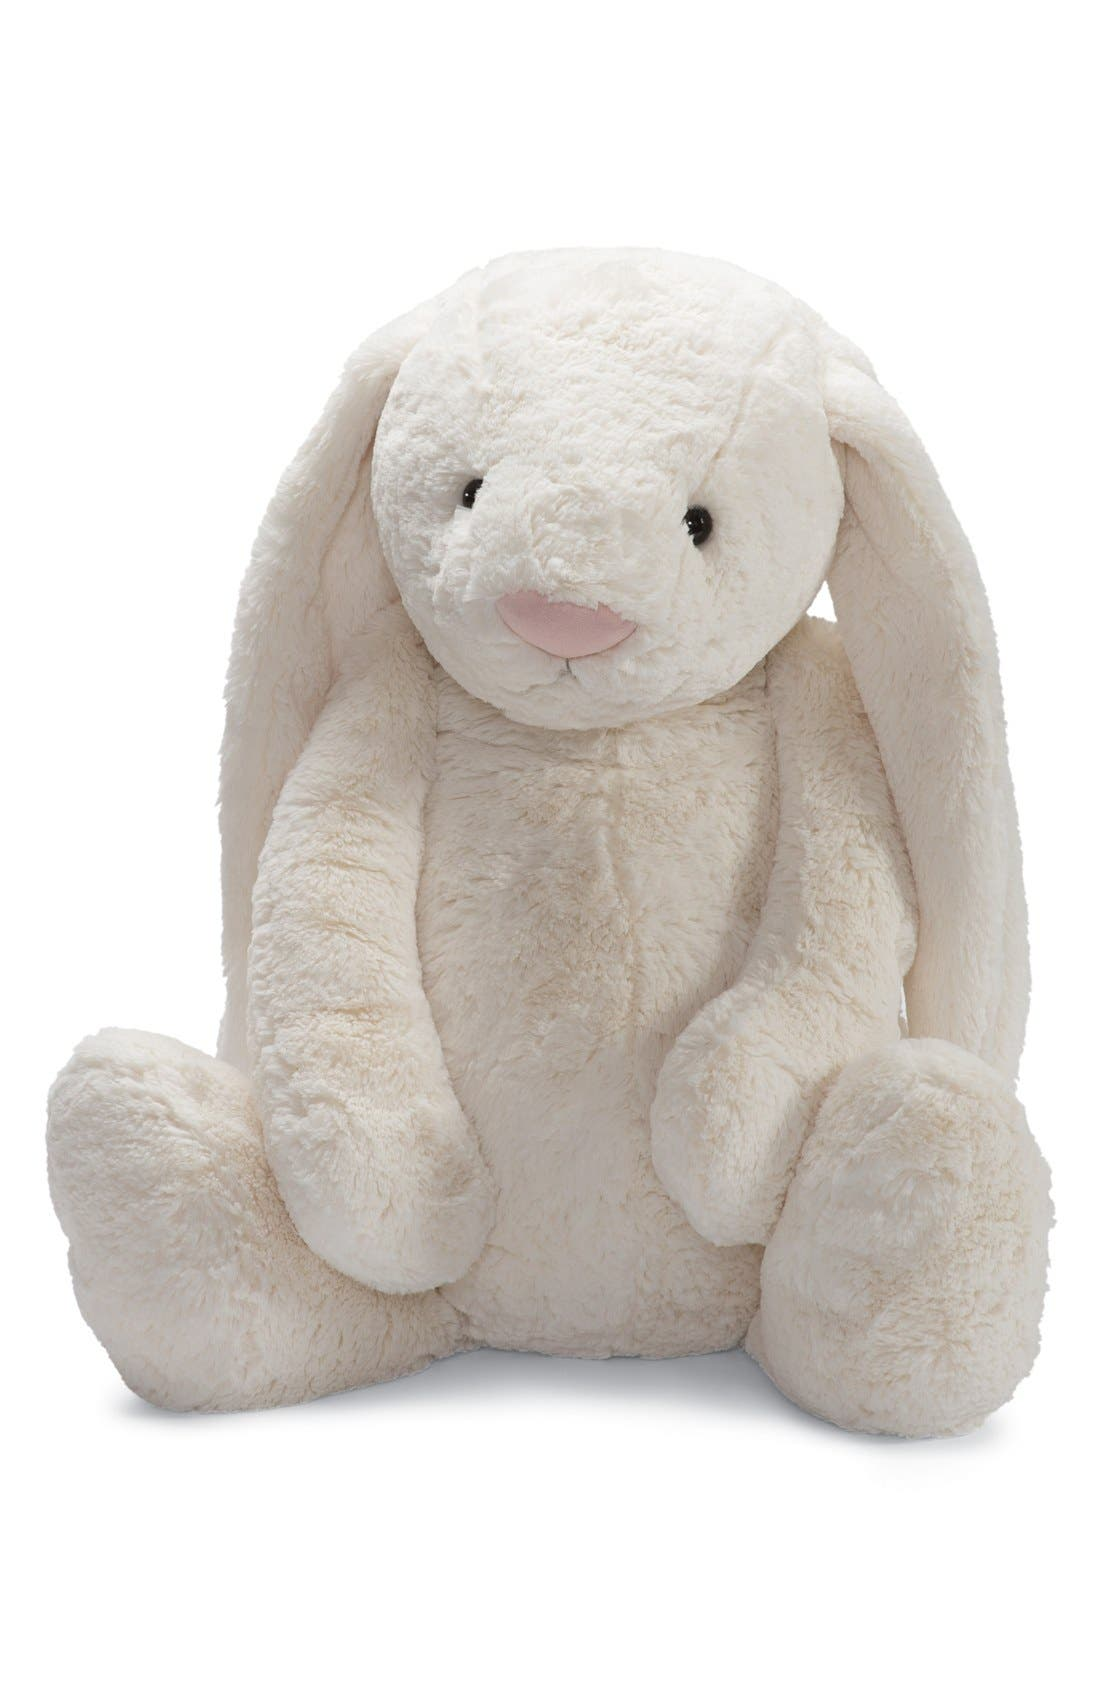 'Huge Bashful Bunny' Stuffed Animal,                             Main thumbnail 1, color,                             CREAM